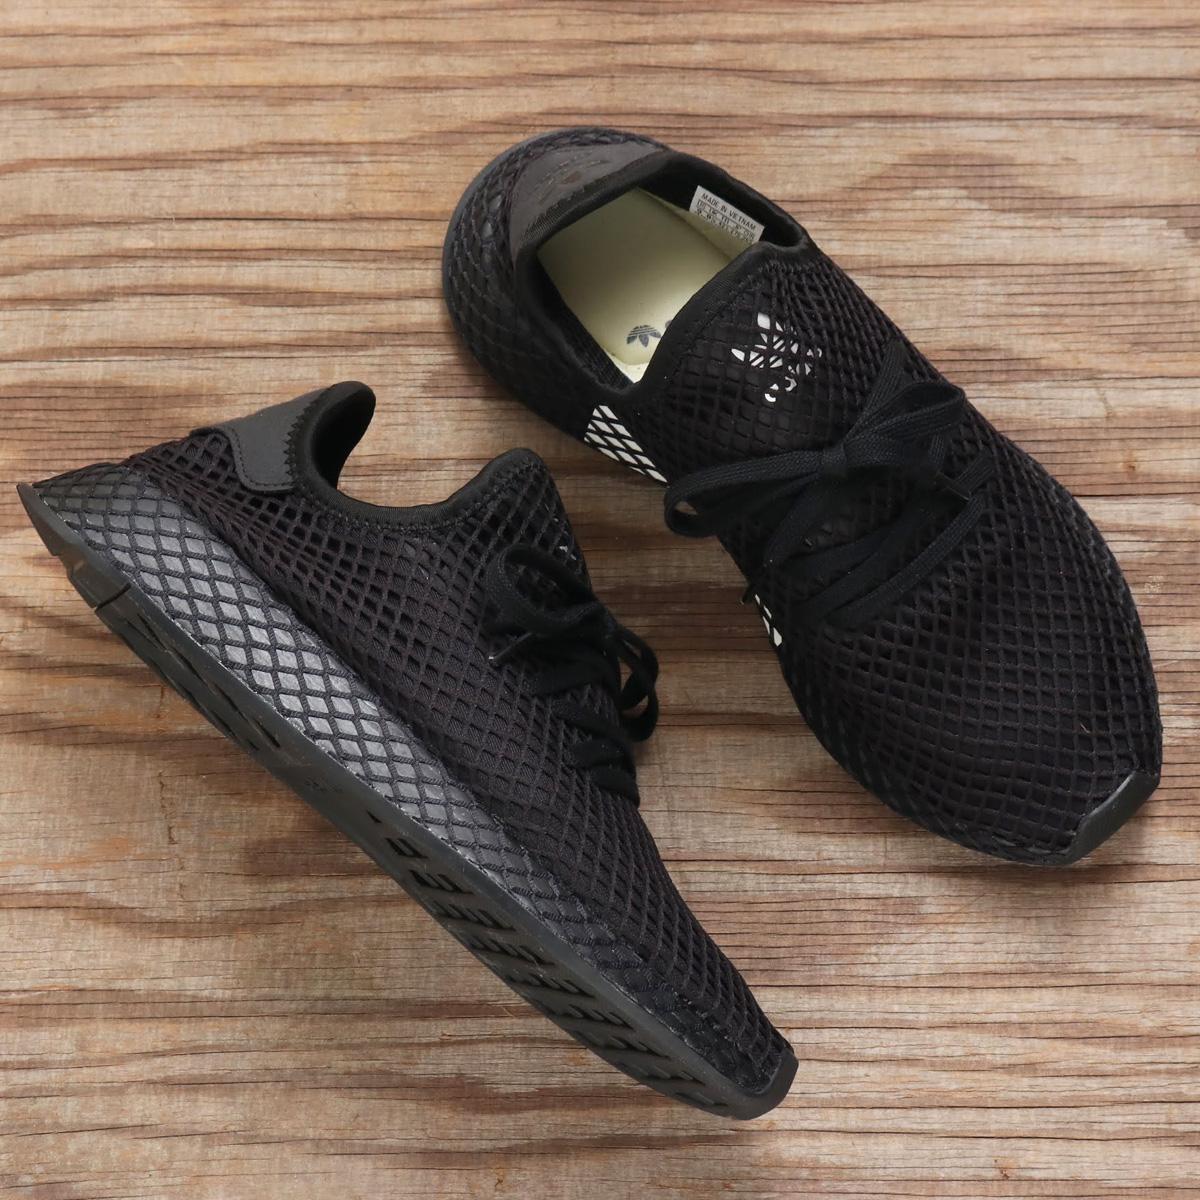 adidas Originals DEERUPT RUNNER(アディダス オリジナルス ディラプトランナー)CORE BLACK/CORE BLACK/RUNNING WHITE【メンズ スニーカー】18FW-I